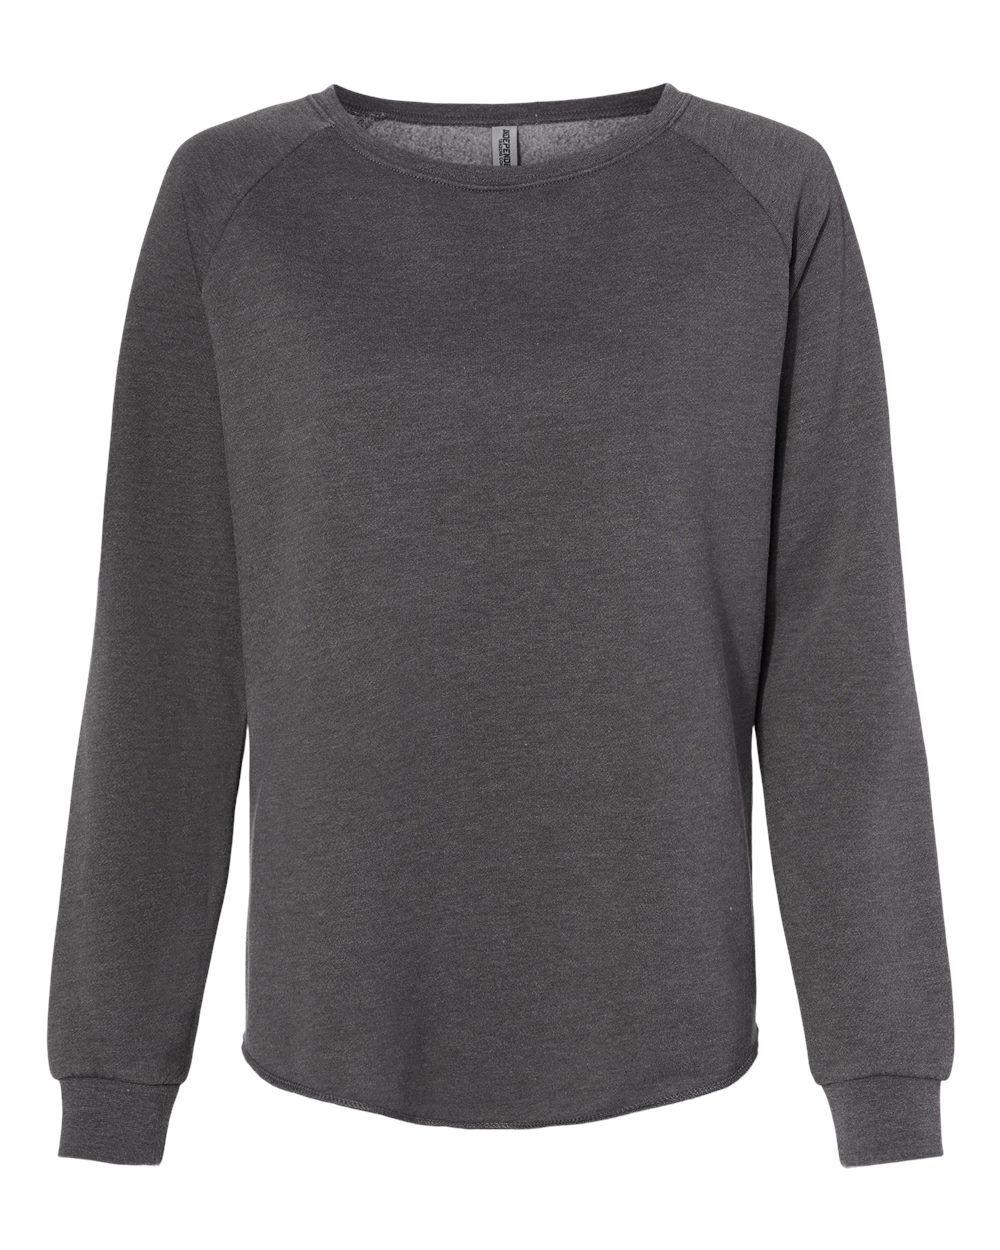 Independent Trading Co. - Women's California Wave Wash Crewneck Sweatshirt - PRM2000 - Shadow - 2X-Large